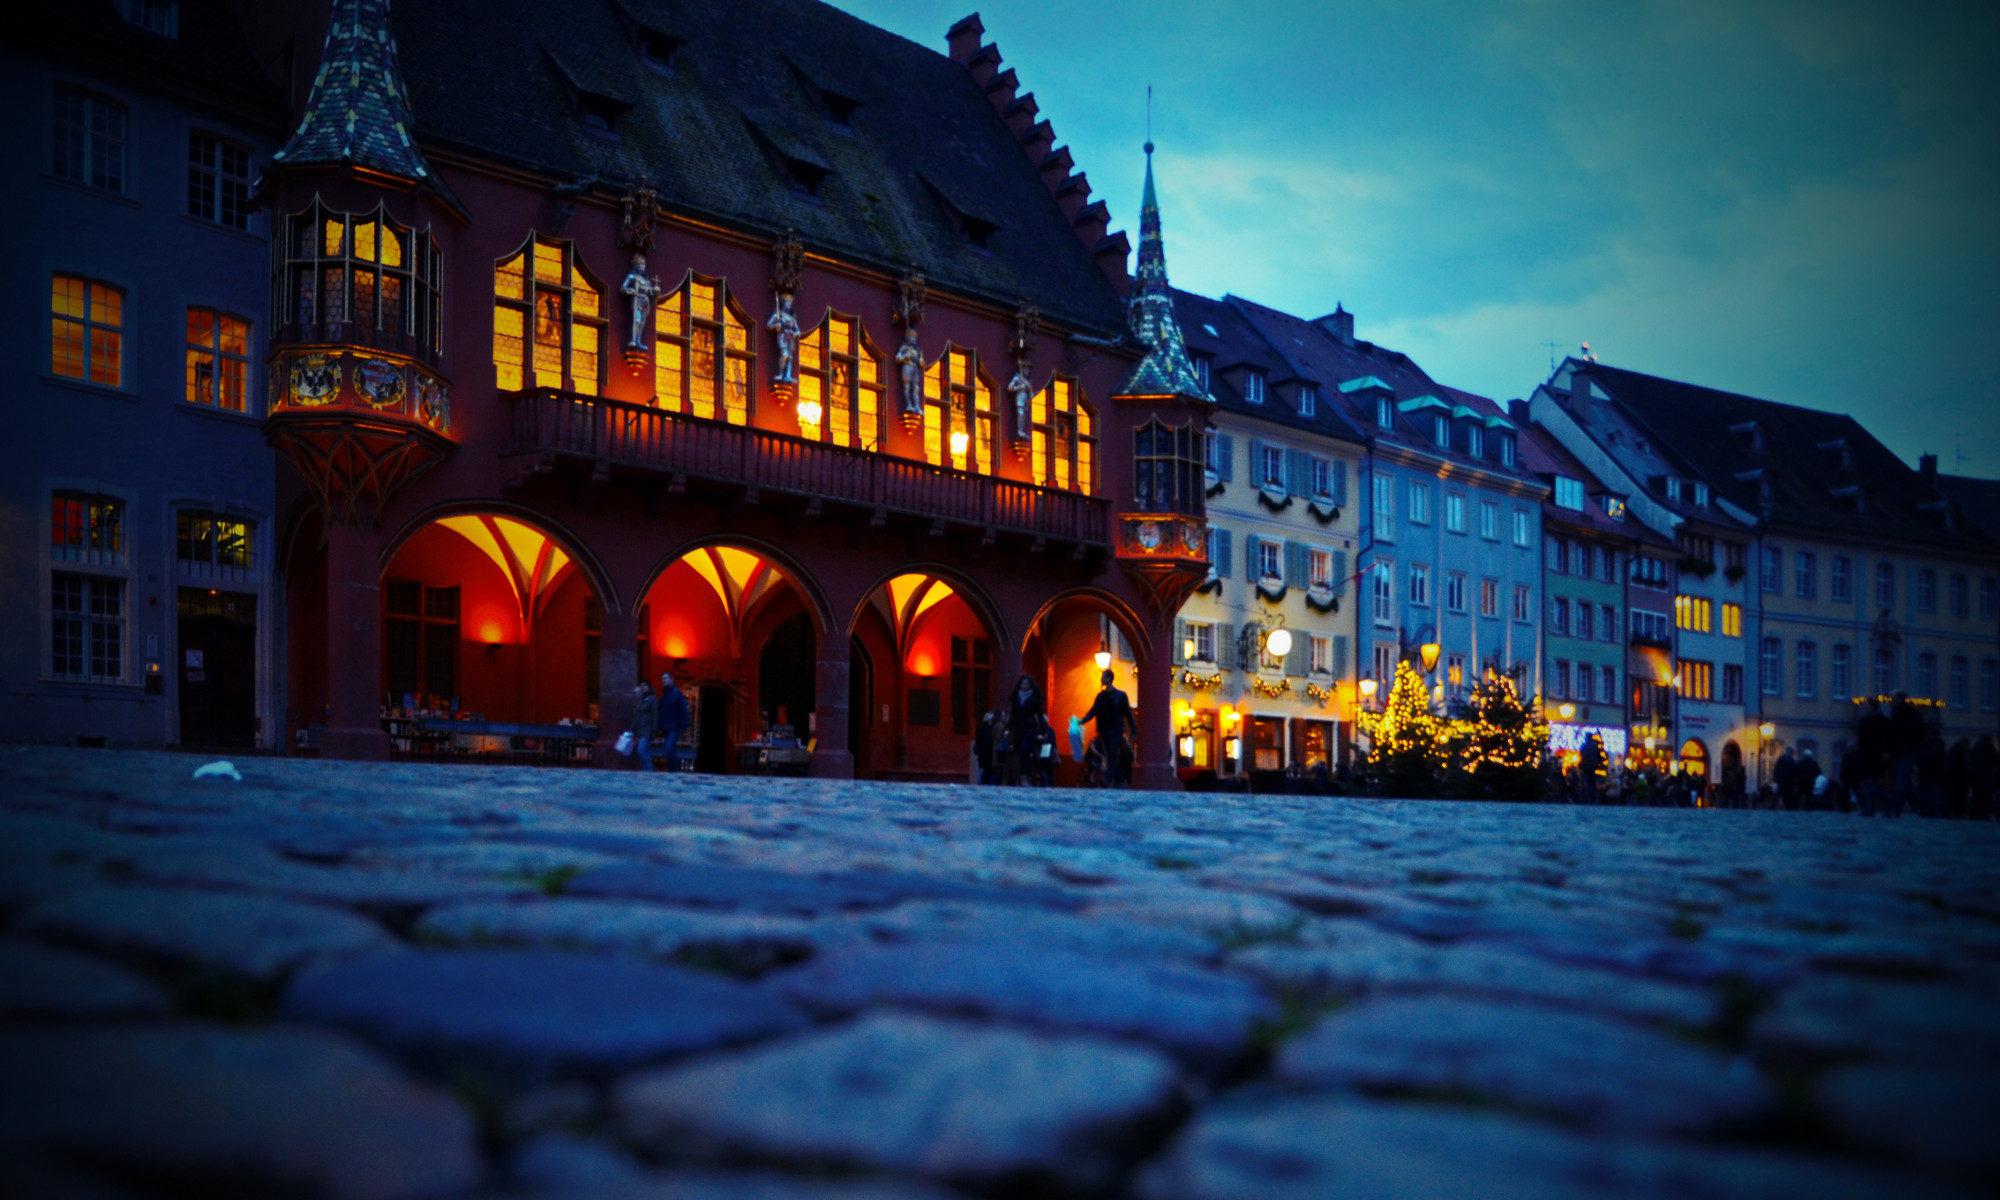 JUG Freiburg